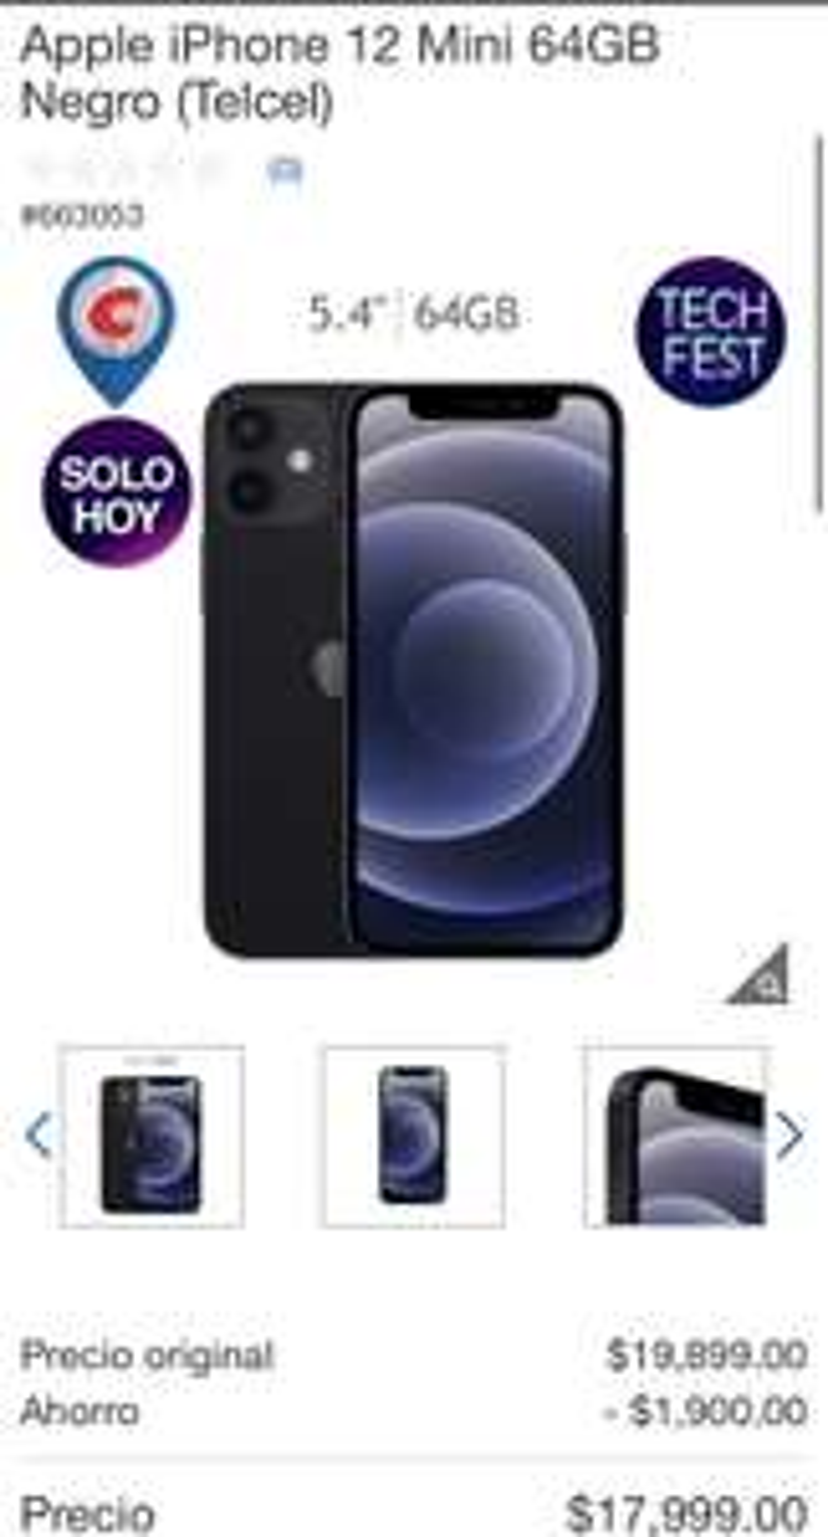 Costco: iPhone 12 mini a 12 MSI